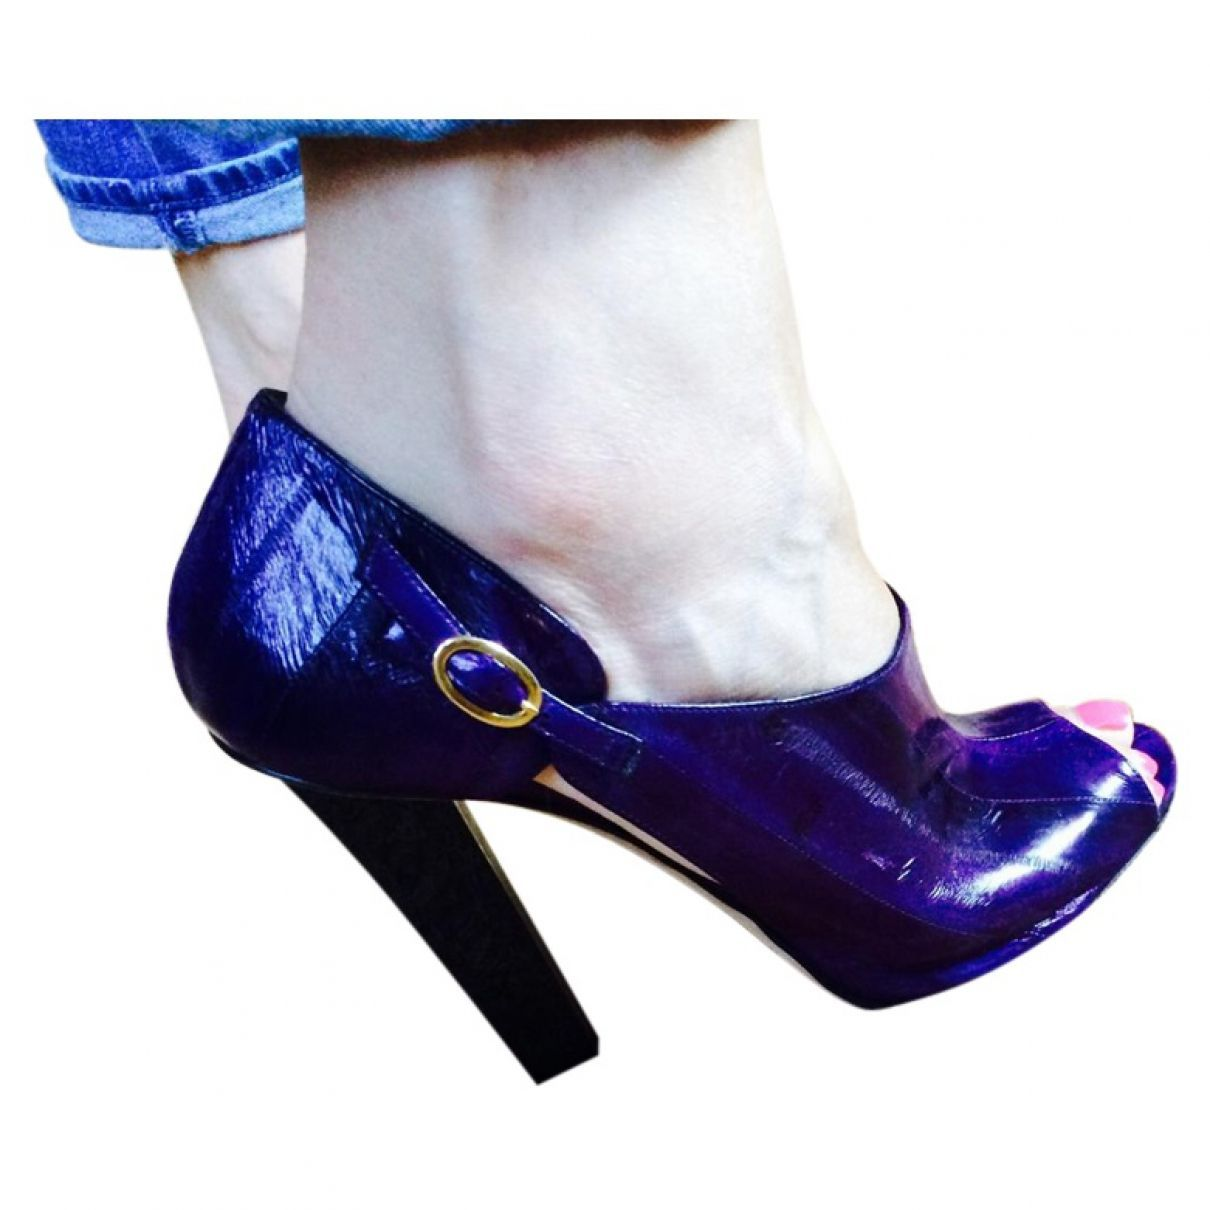 a92b2d5a400e JIMMY CHOO  Purple Exotic leathers Heels  527.31 SIZE  40 EU